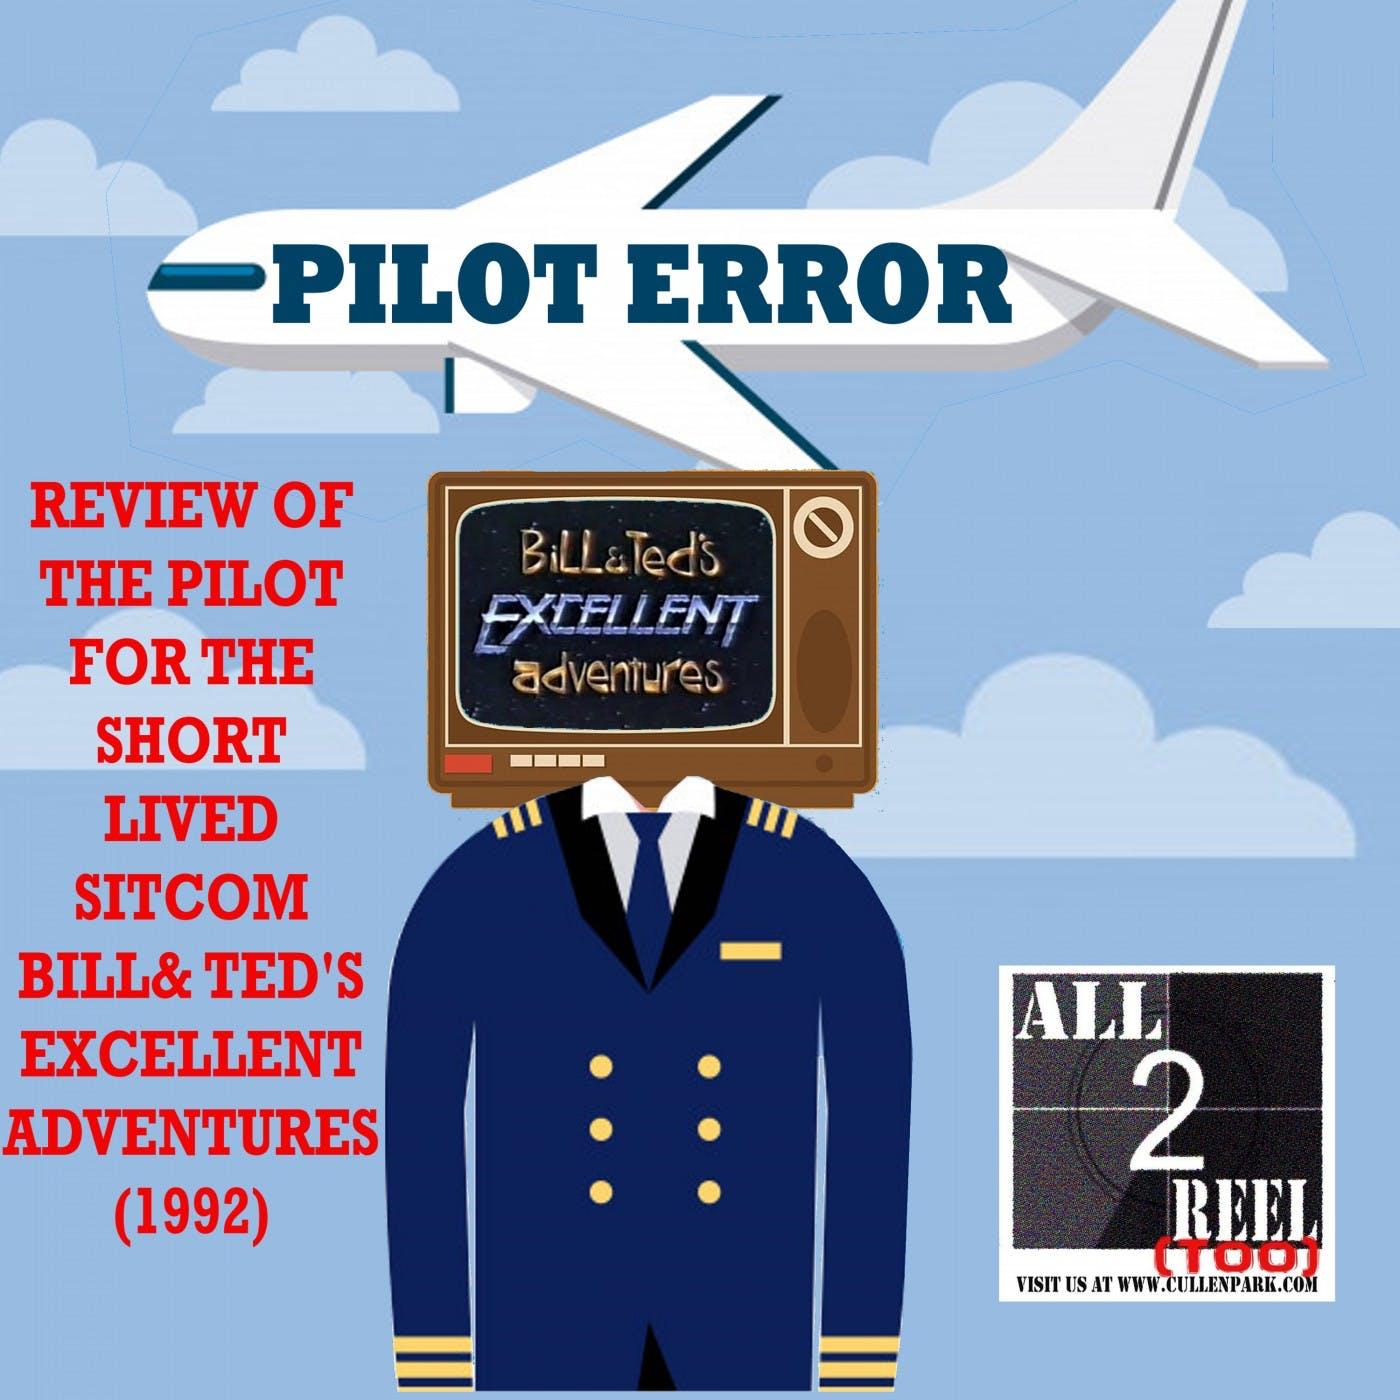 Bill & Ted's Excellent Adventures (1992) PILOT ERROR TV REVIEW